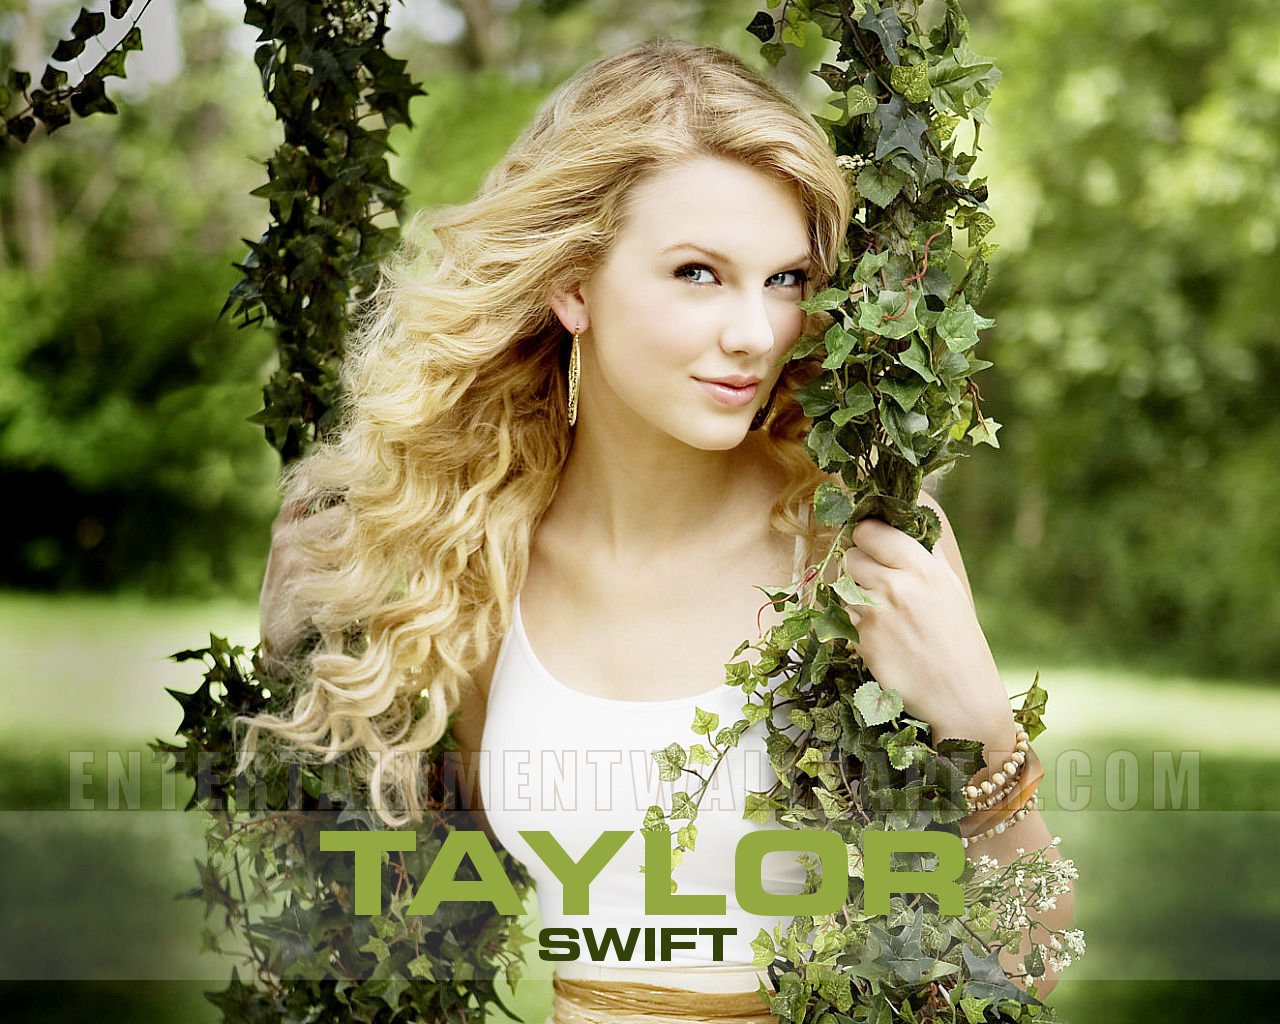 Taylor Swift Wallpapers-ts-taylor-swift-10687137-1280-1024